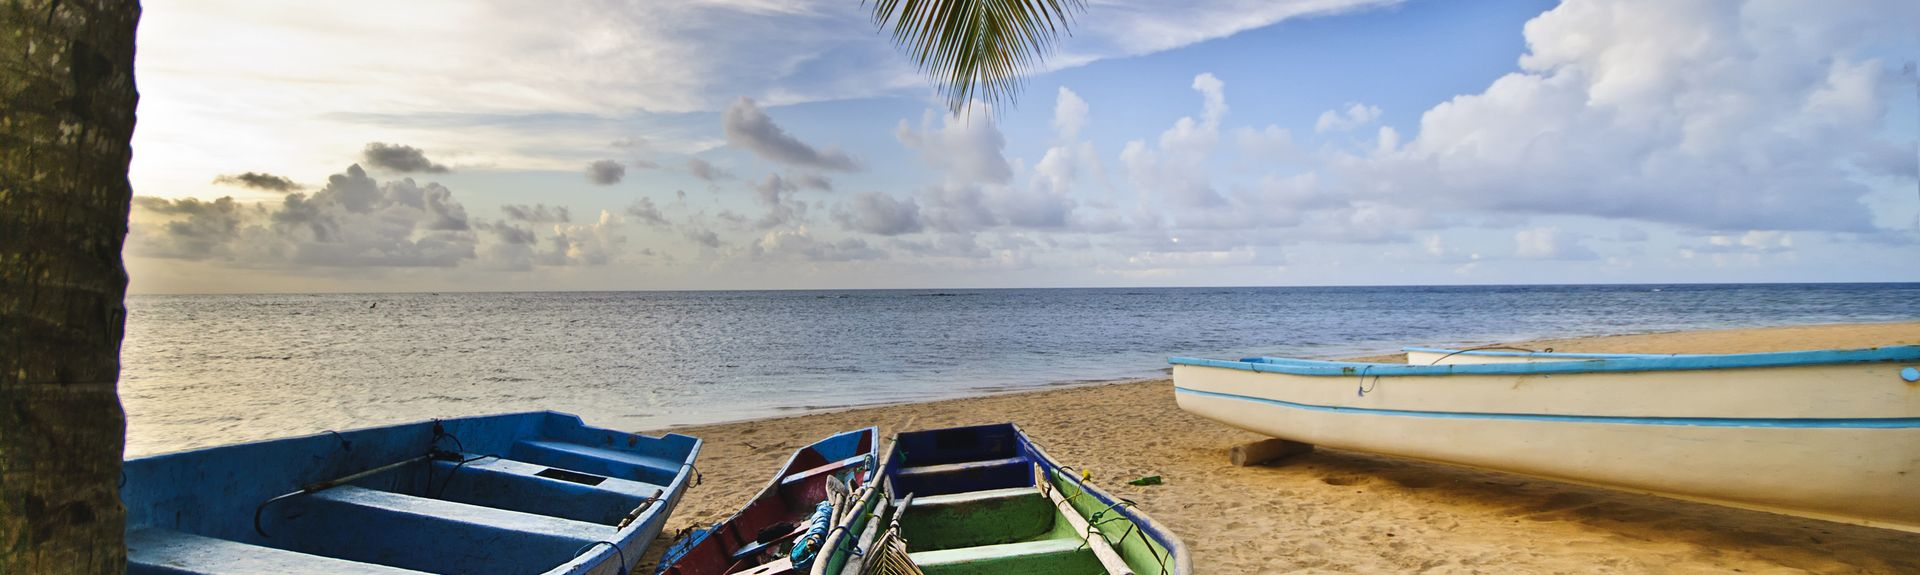 Samaná, Samaná (provincia), República Dominicana